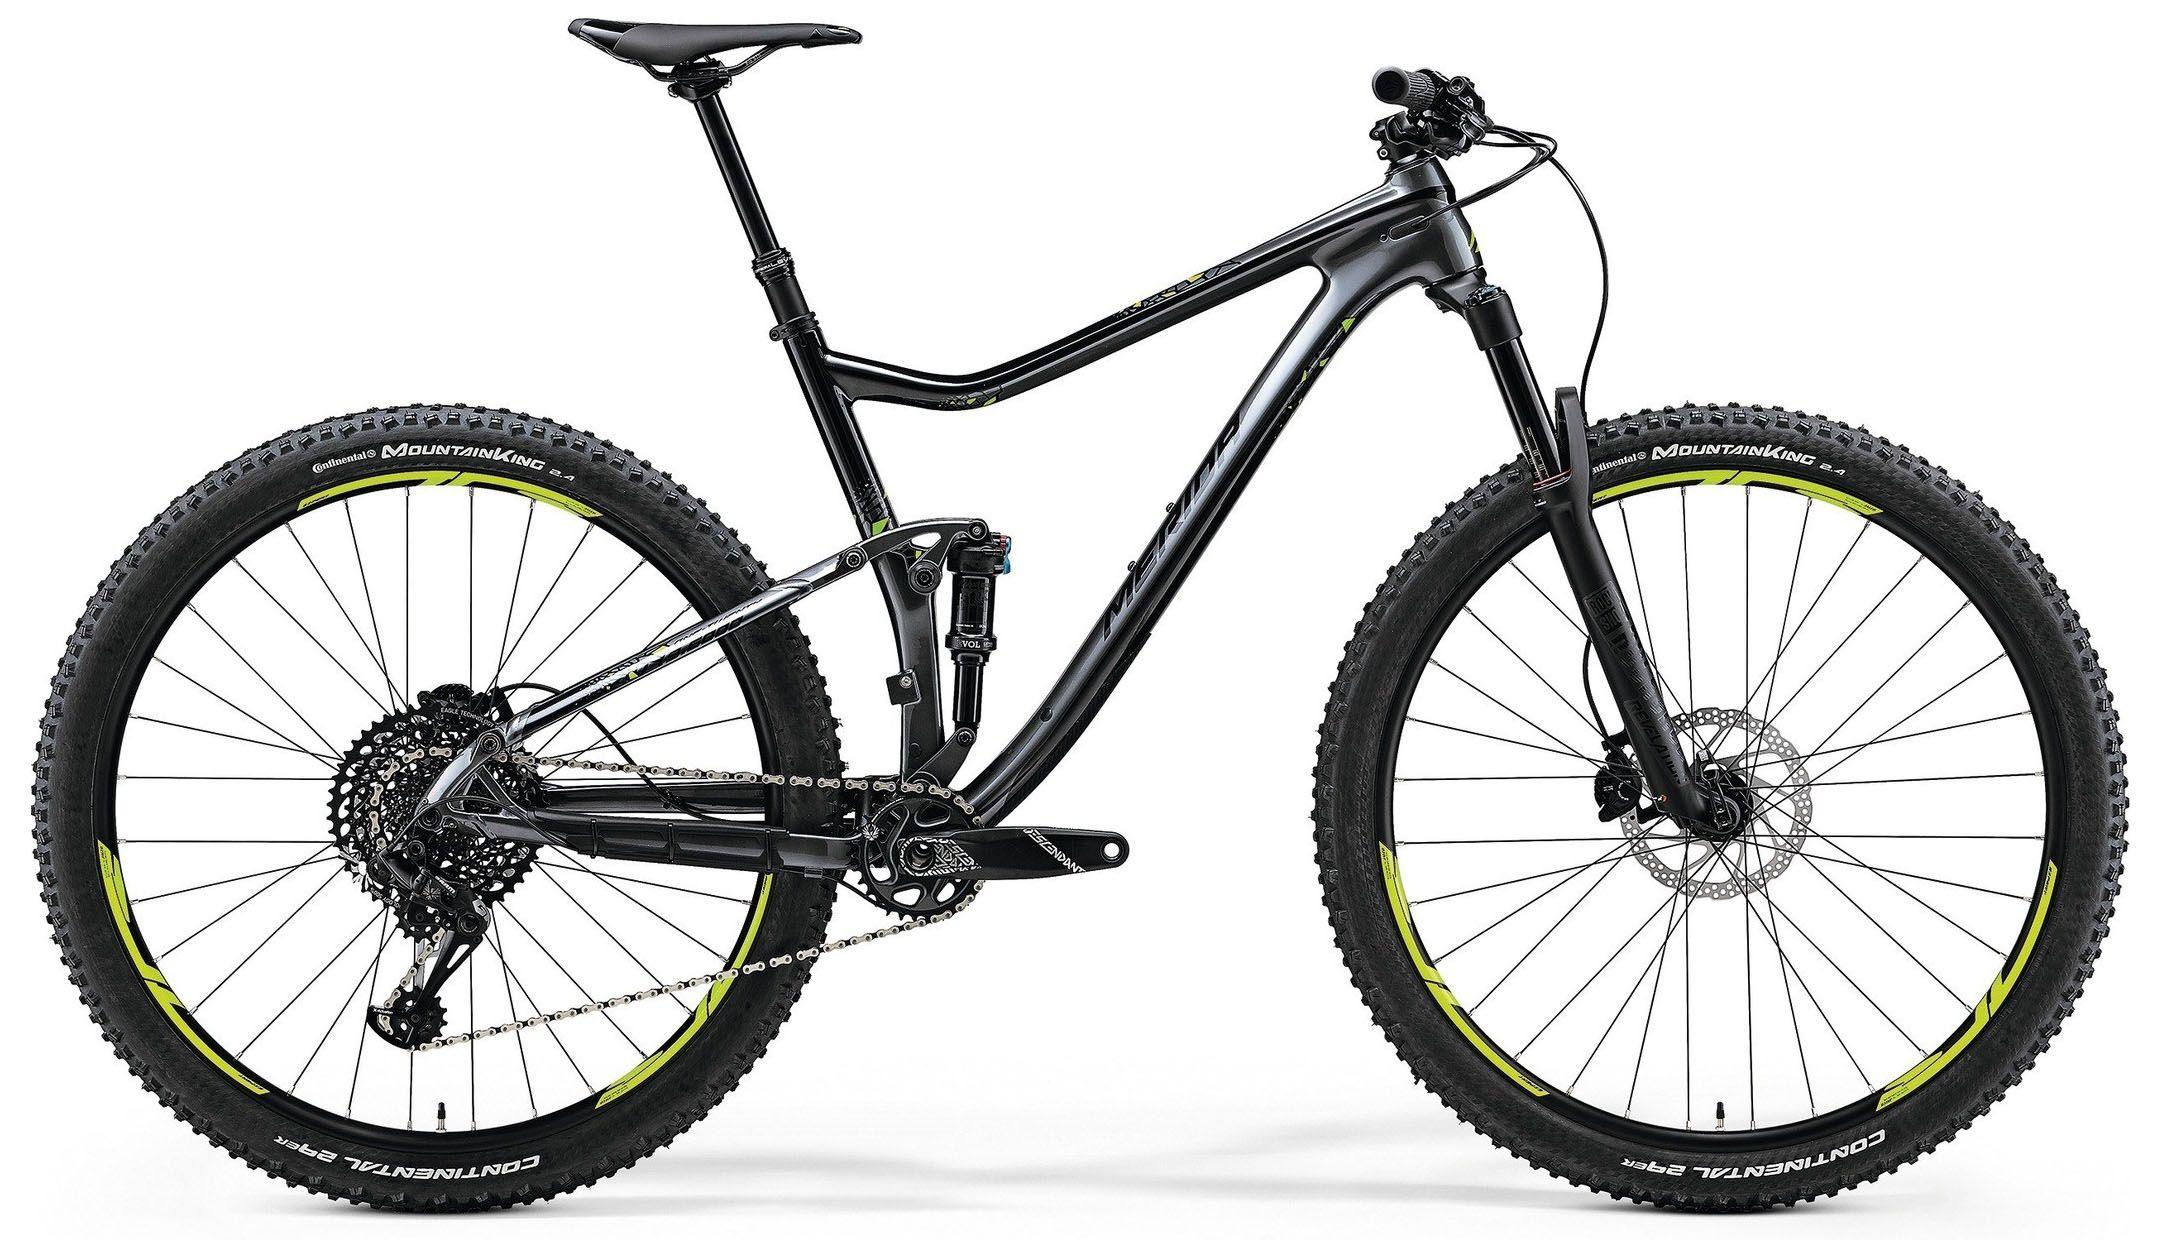 Велосипед Merida One-Twenty 7.6000 2018,  Двухподвесы  - артикул:287993